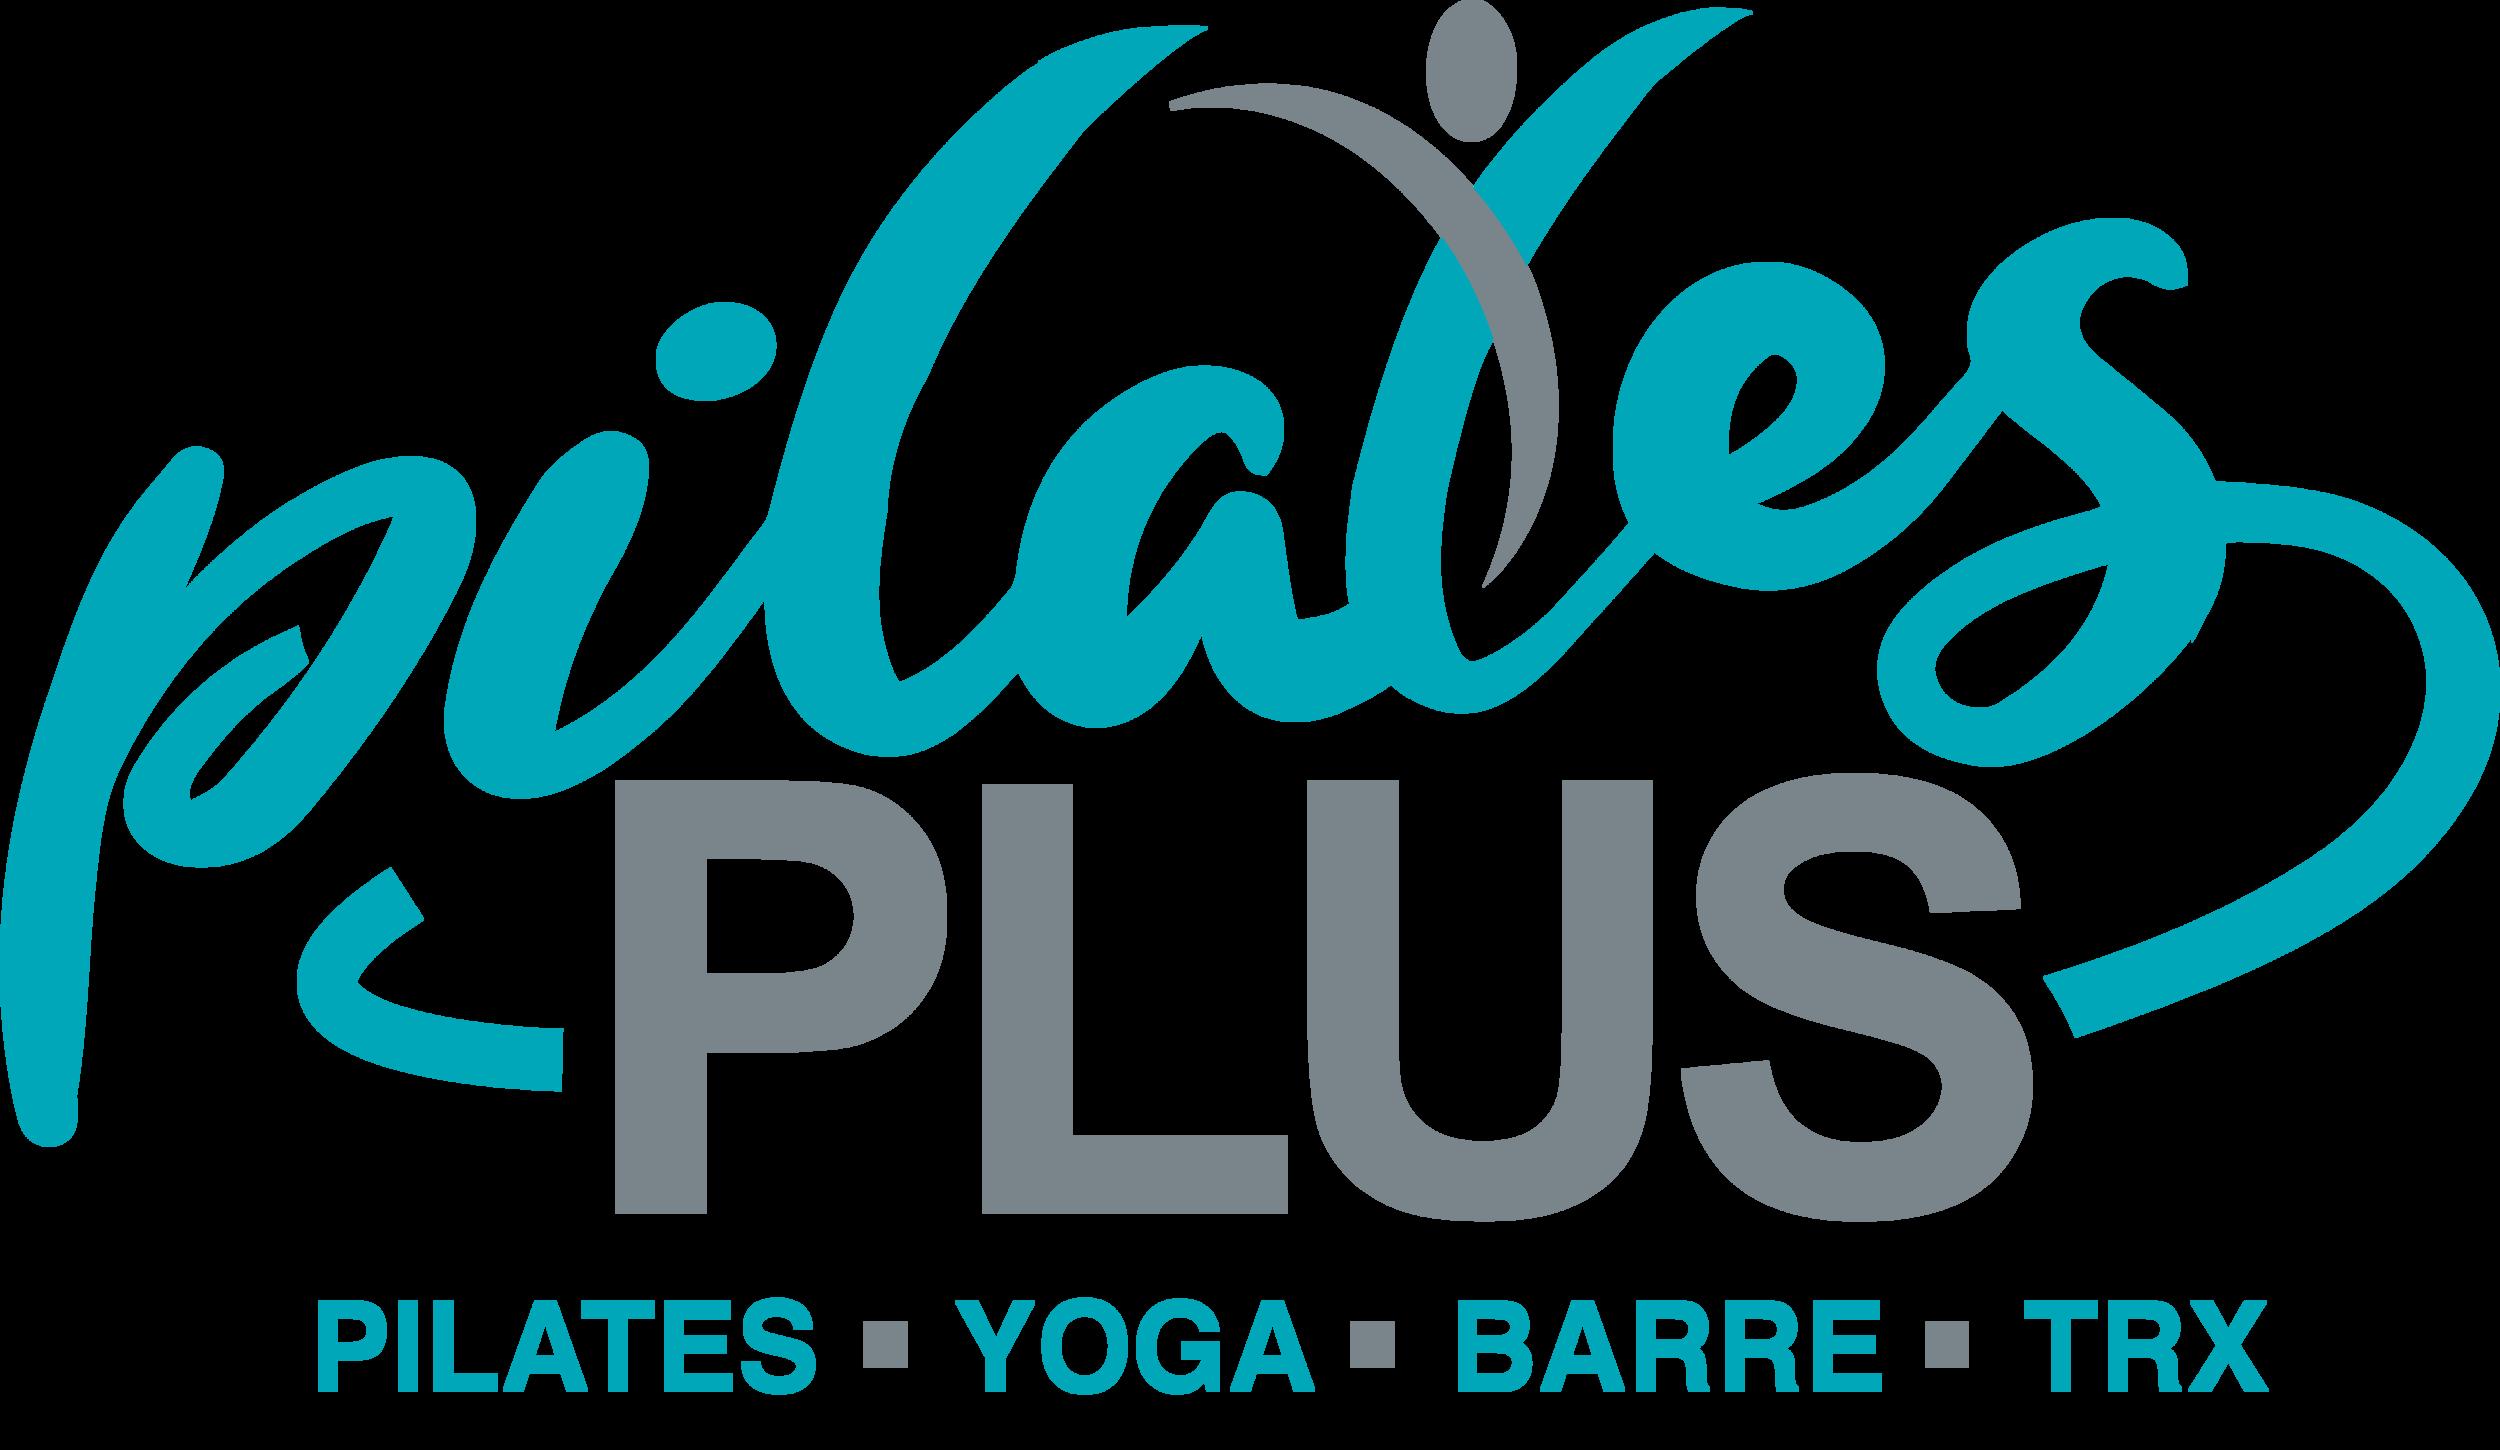 pilates_plus_logo_final-01.png